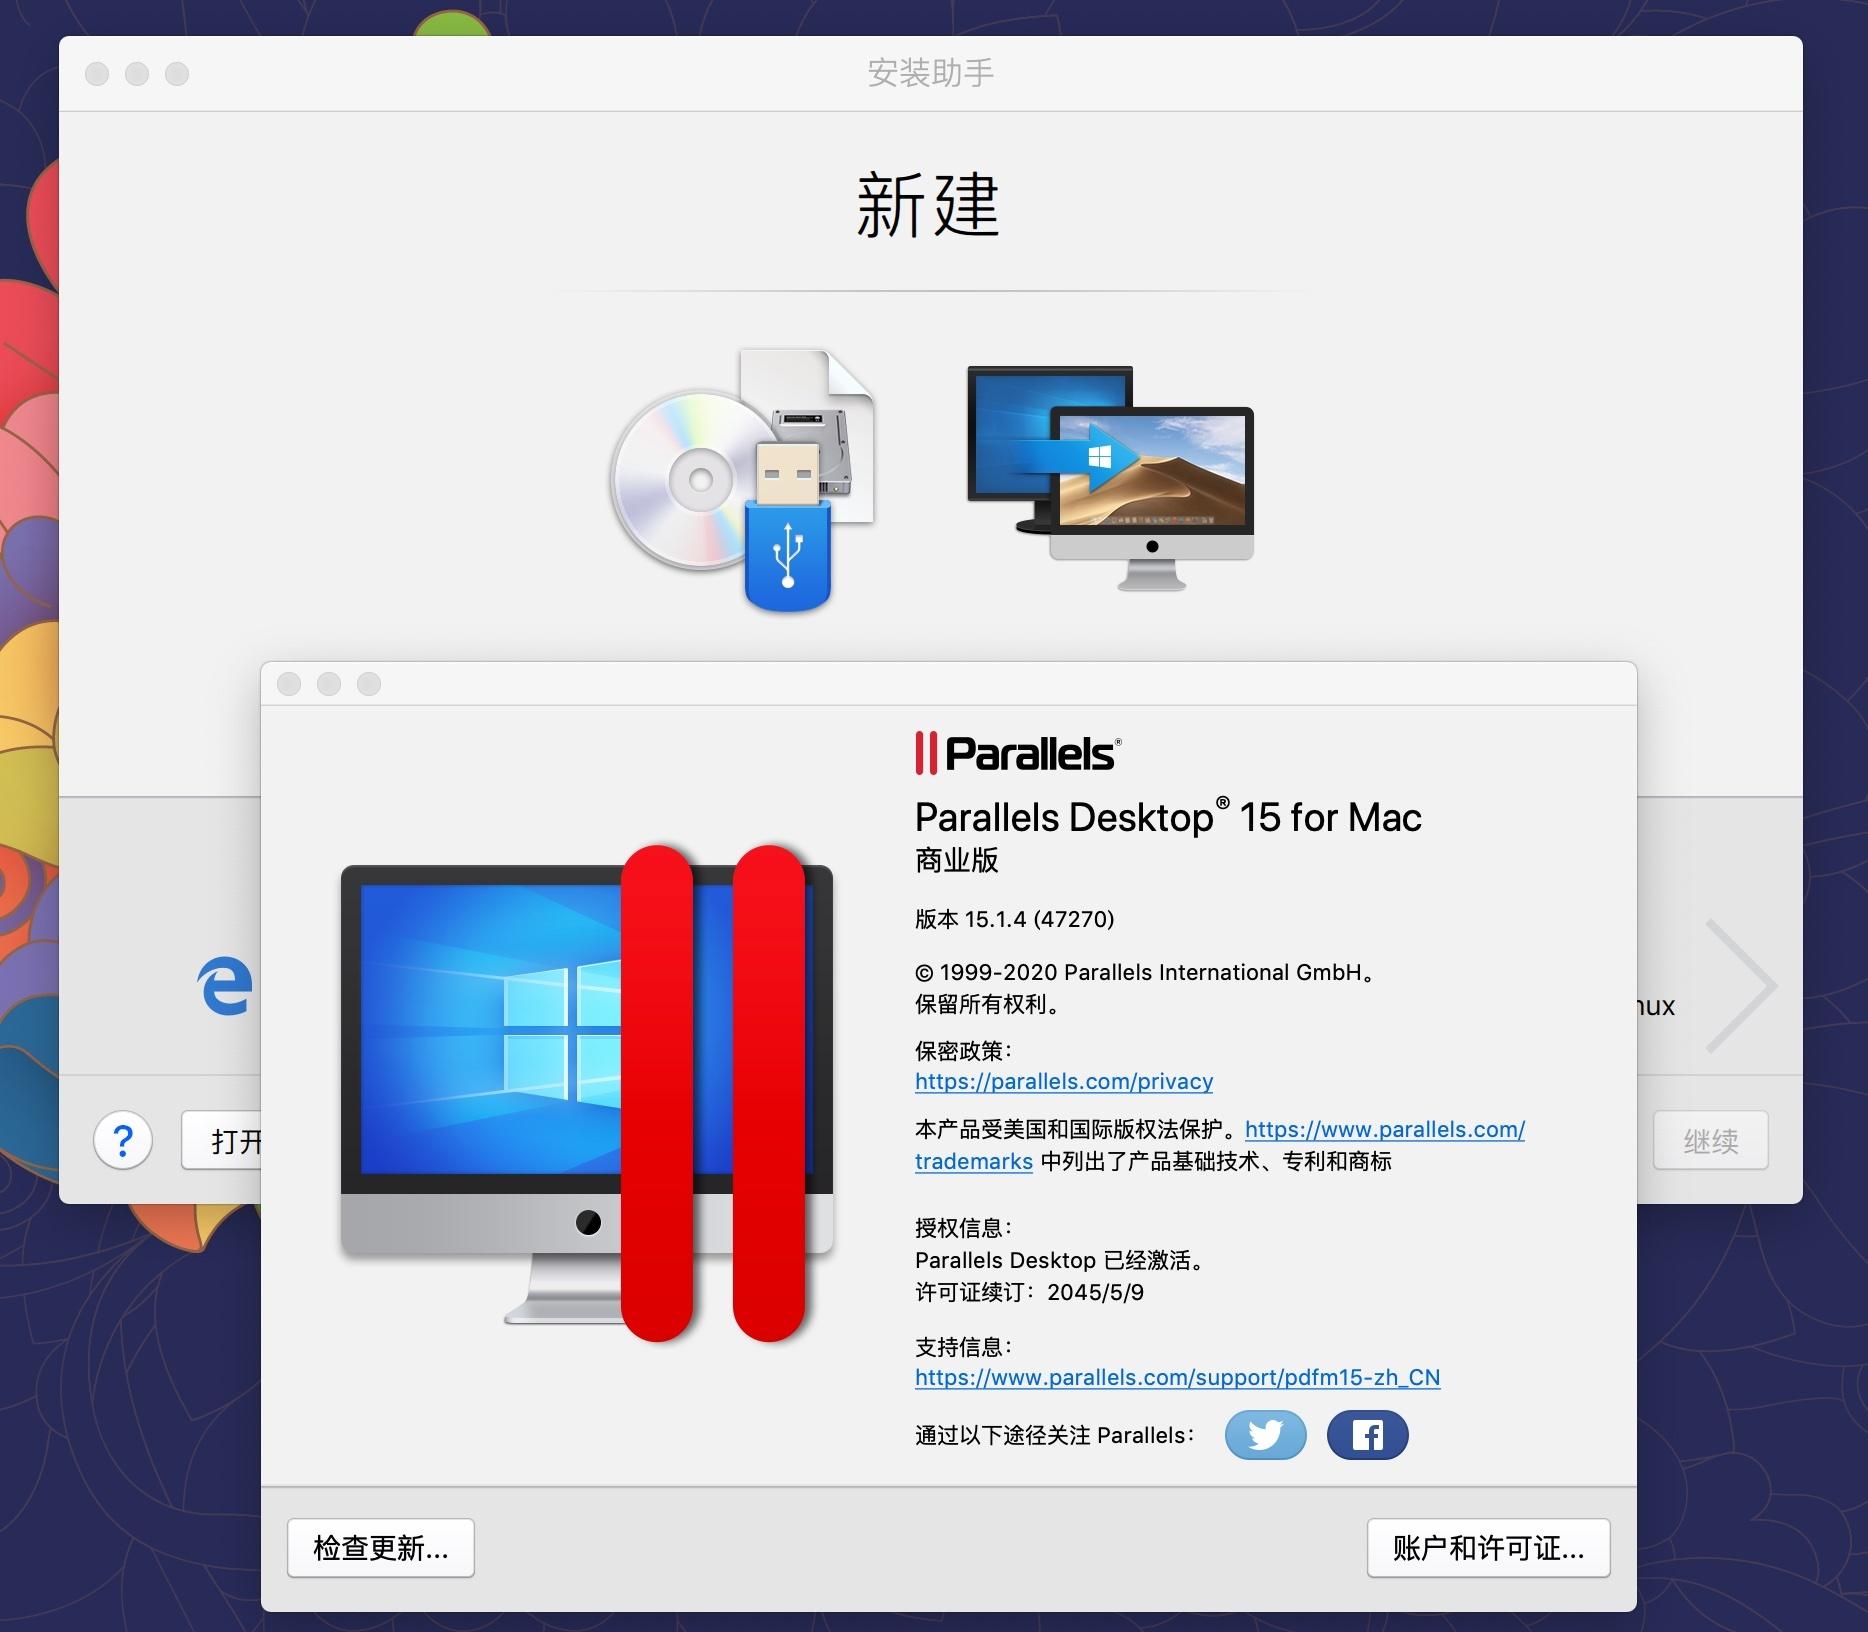 Parallels Desktop Business Edition 16.0.0.48916中文破解版 最佳Mac虚拟机解决方案-马克喵